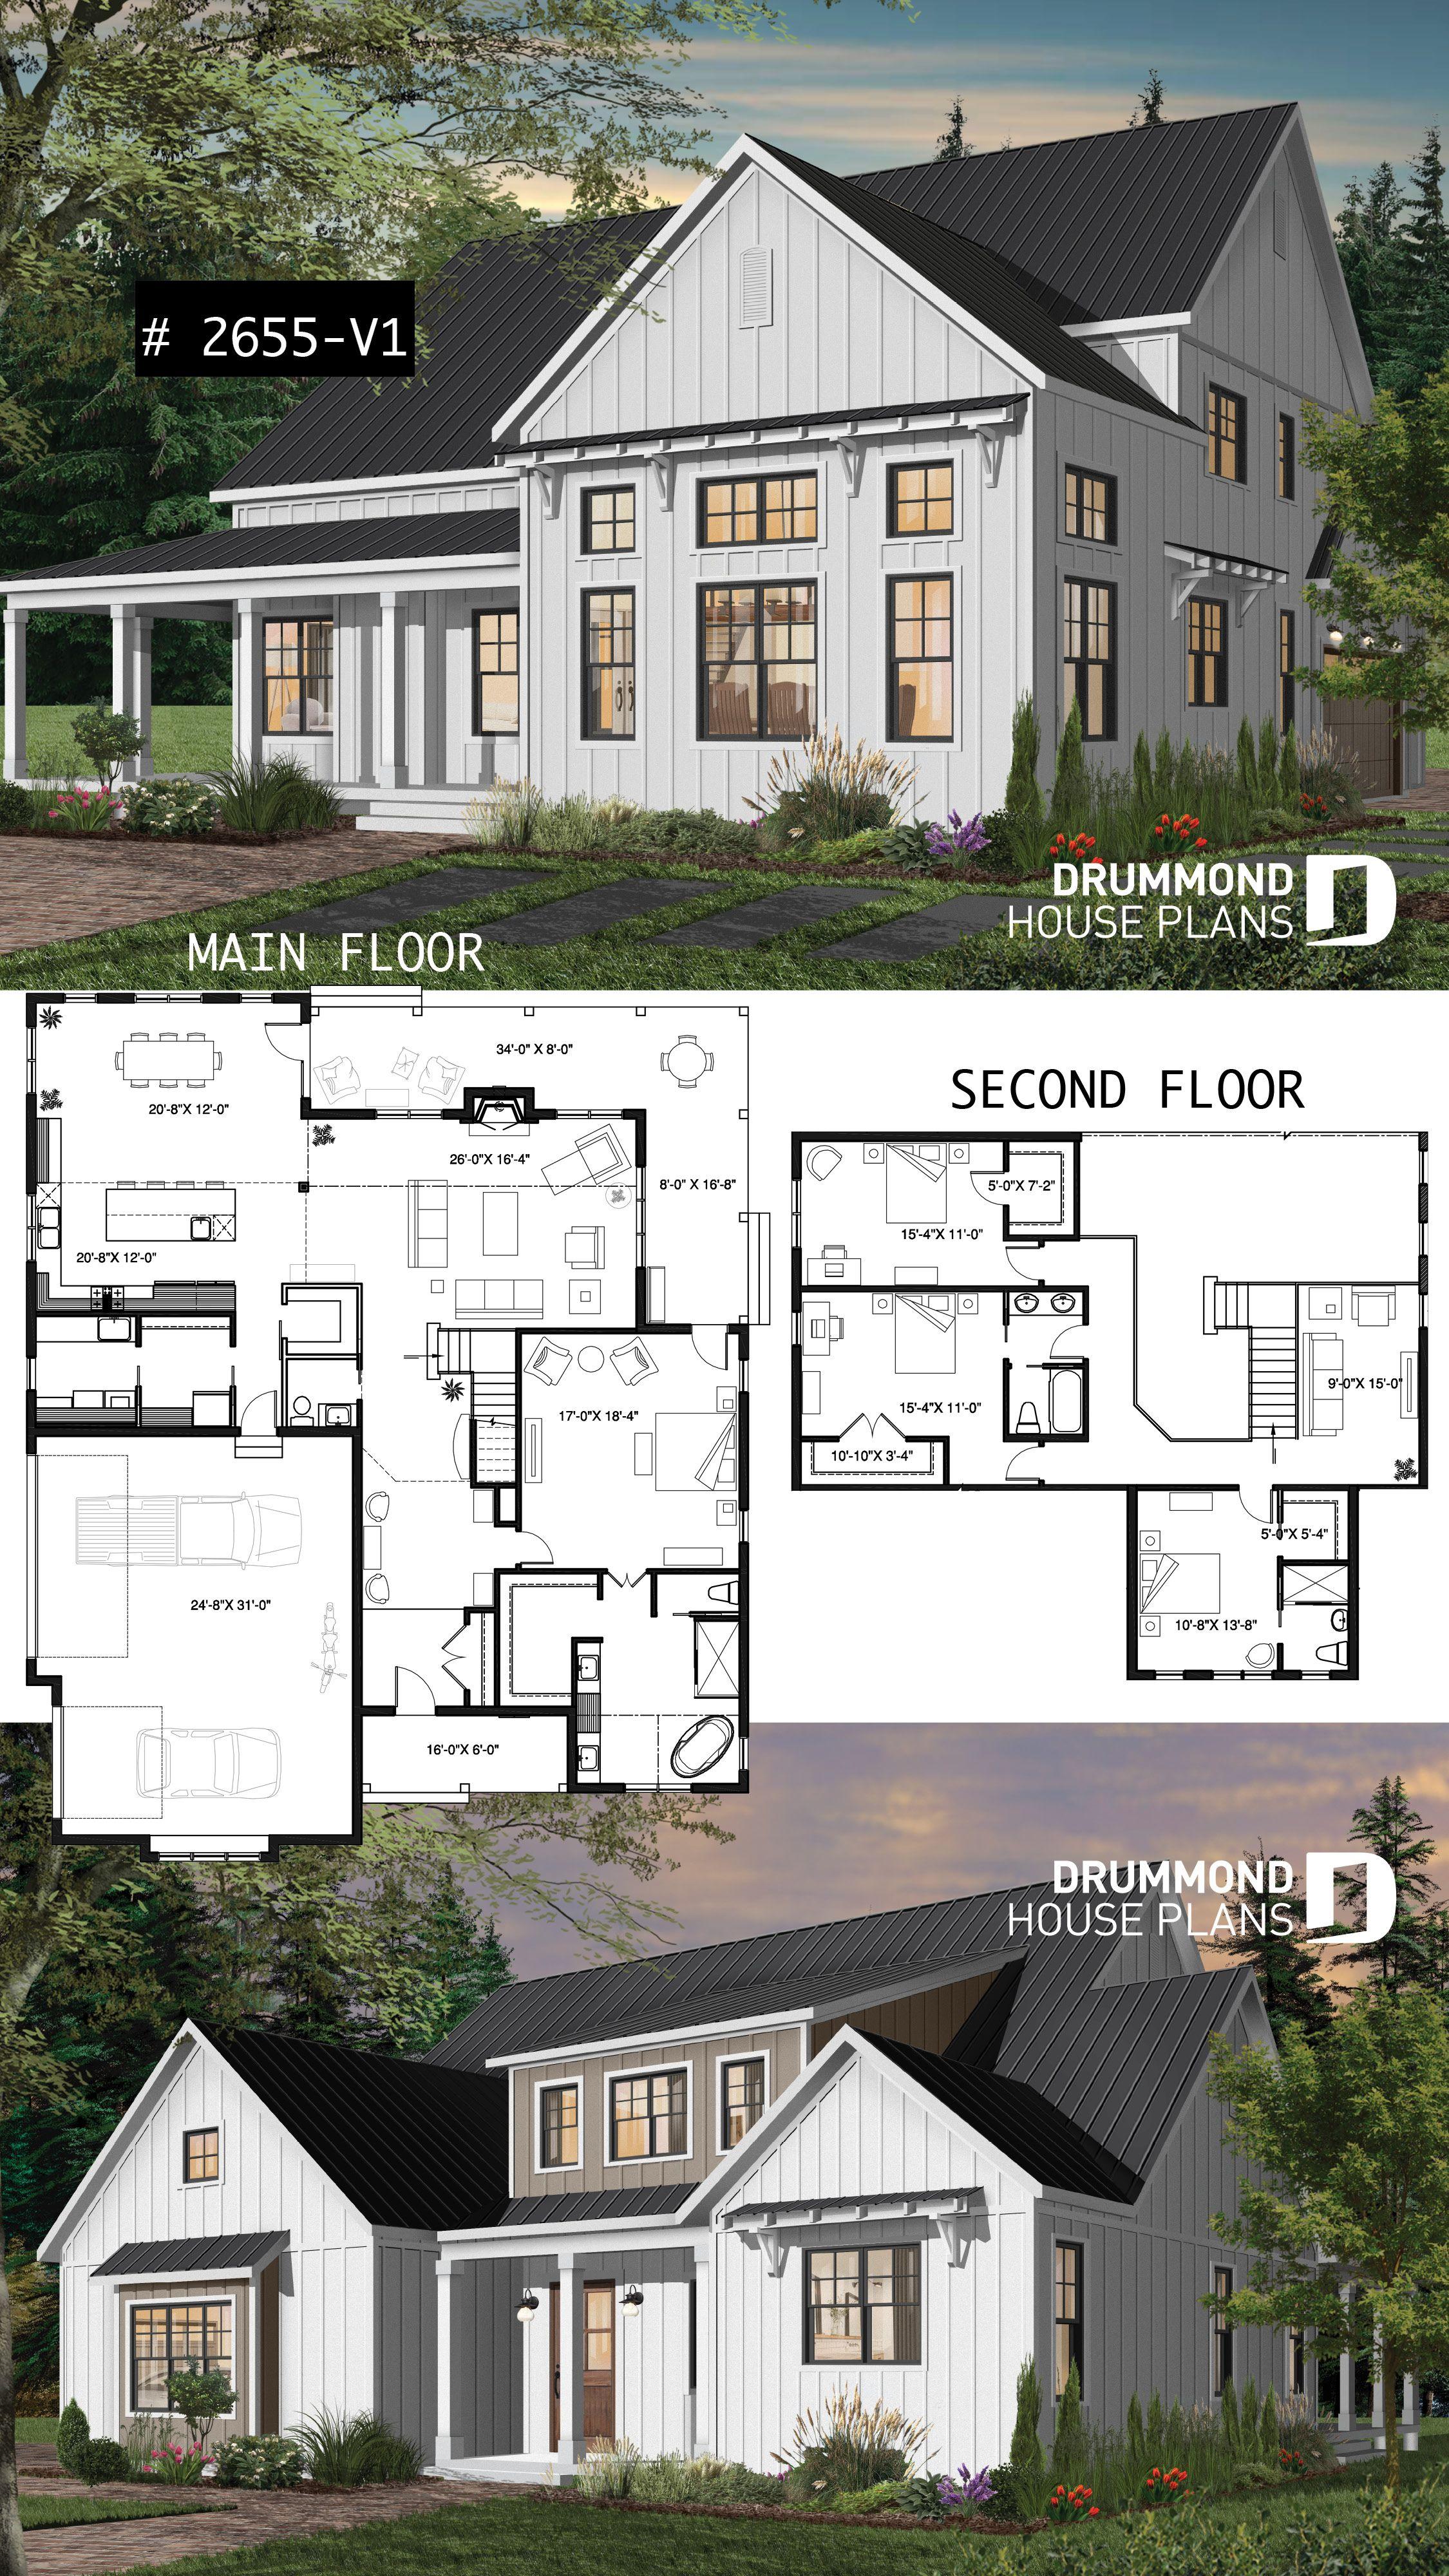 White Modern Farmhouse Plan 4 Bedrooms Master Suite 3 Car Garage Fireplace Large K Plans Floorplan Small